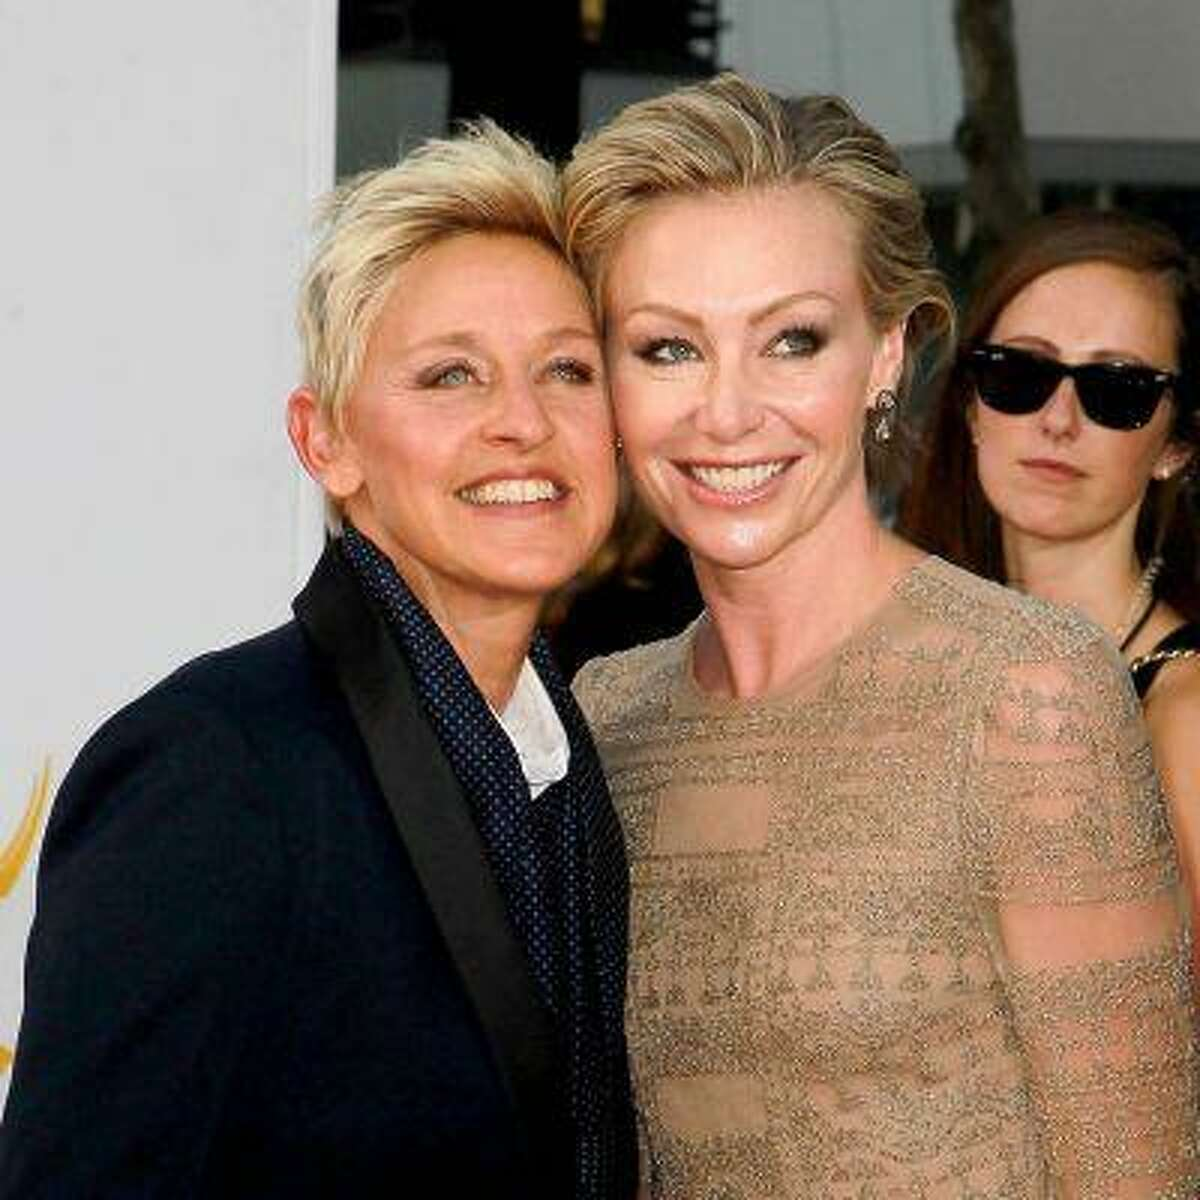 Ellen DeGeneres and Portia de Rossi 64th Annual Primetime Emmy Awards, held at Nokia Theatre L.A. Live - Arrivals Los Angeles, California - 23.09.12 Mandatory Credit: WENN.com/FayesVision